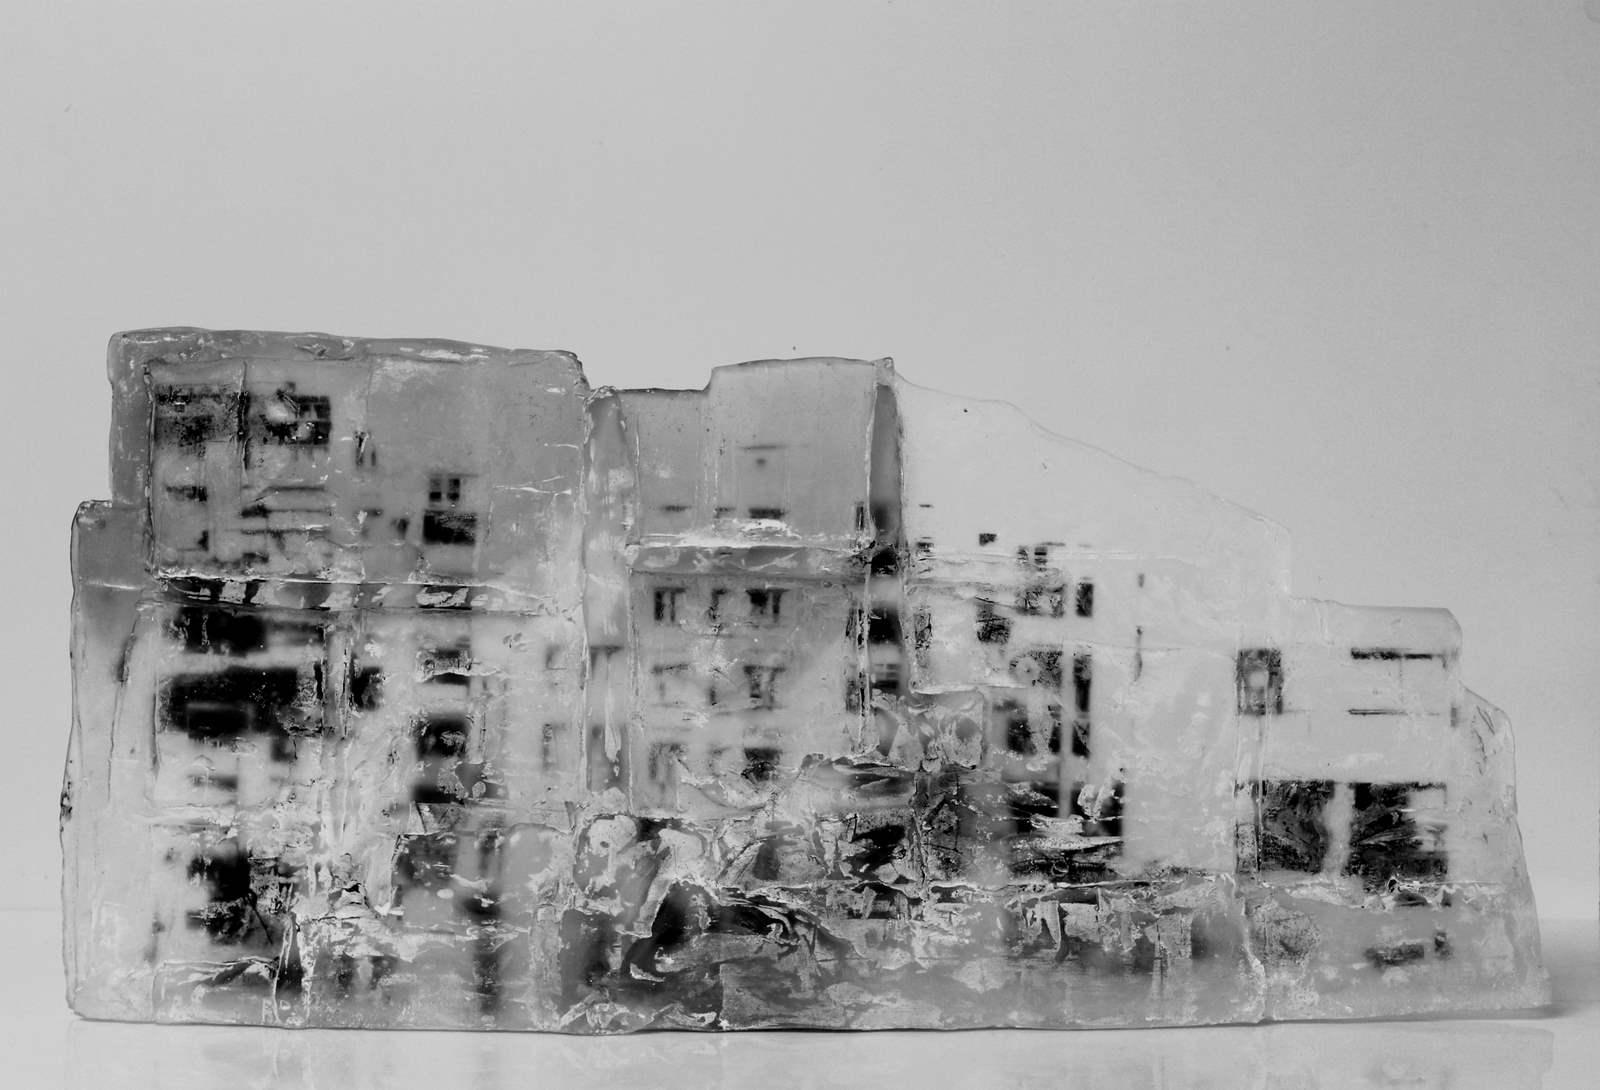 Grande façade, pâte de verre, verre gris et incolore, sérigraphie